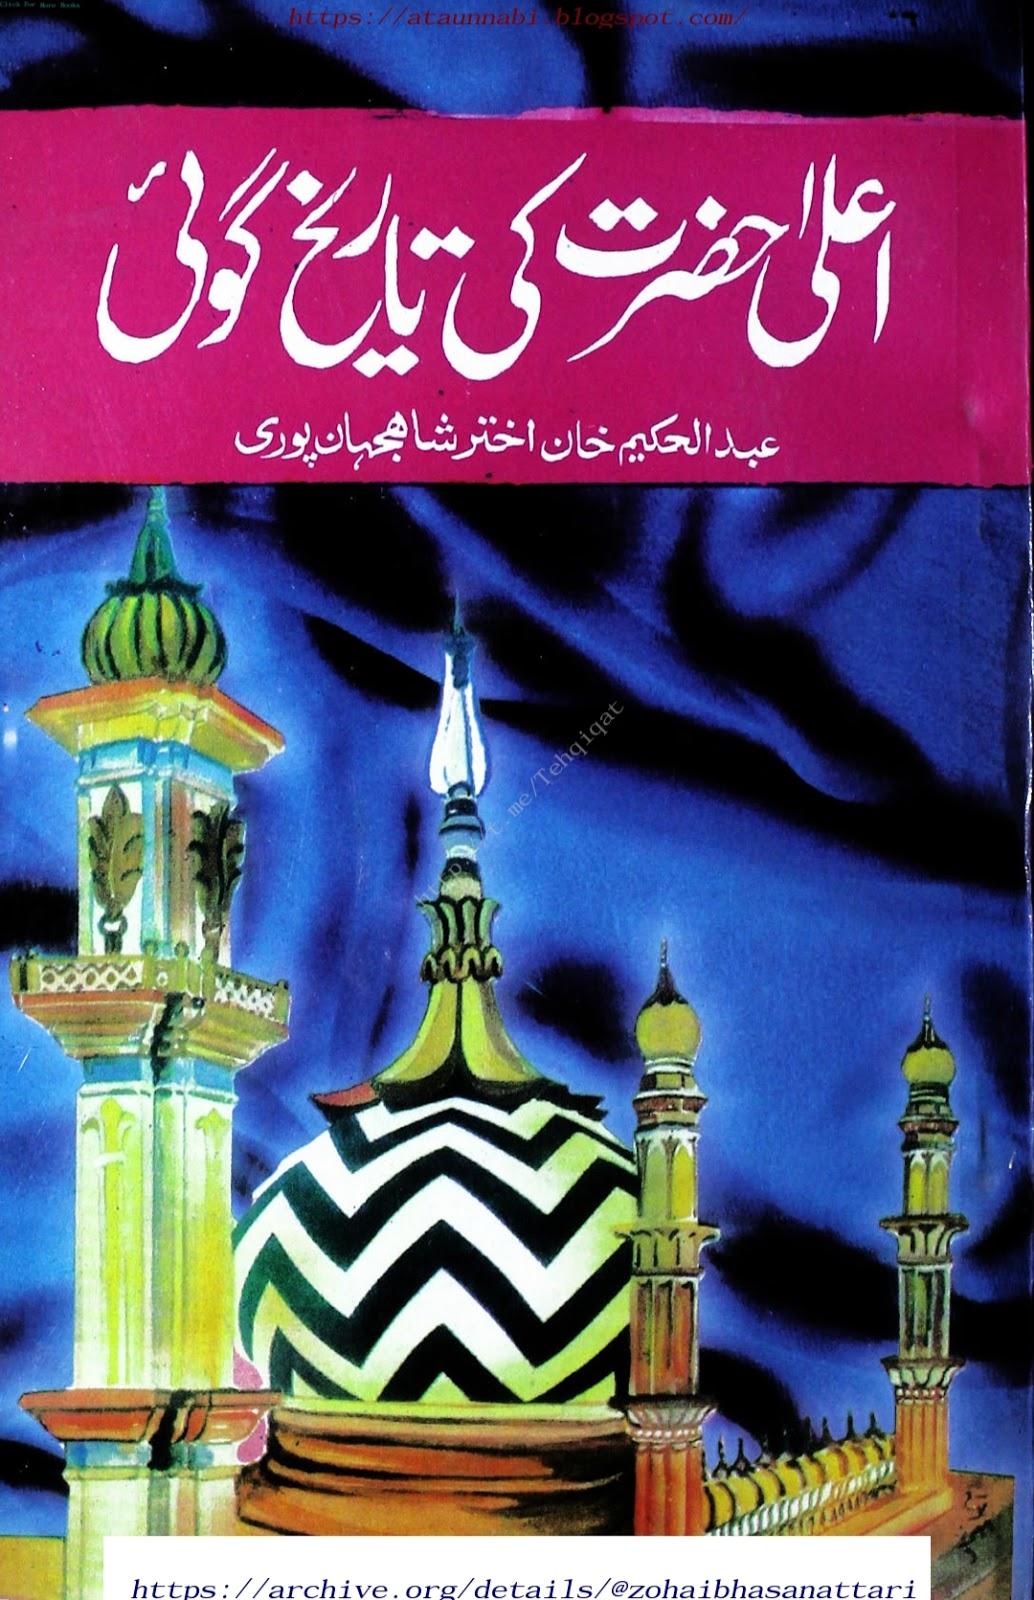 Aala Hazrat Ki Tareekh Goi / اعلی حضرت کی تاریخ گوئی by فاضل